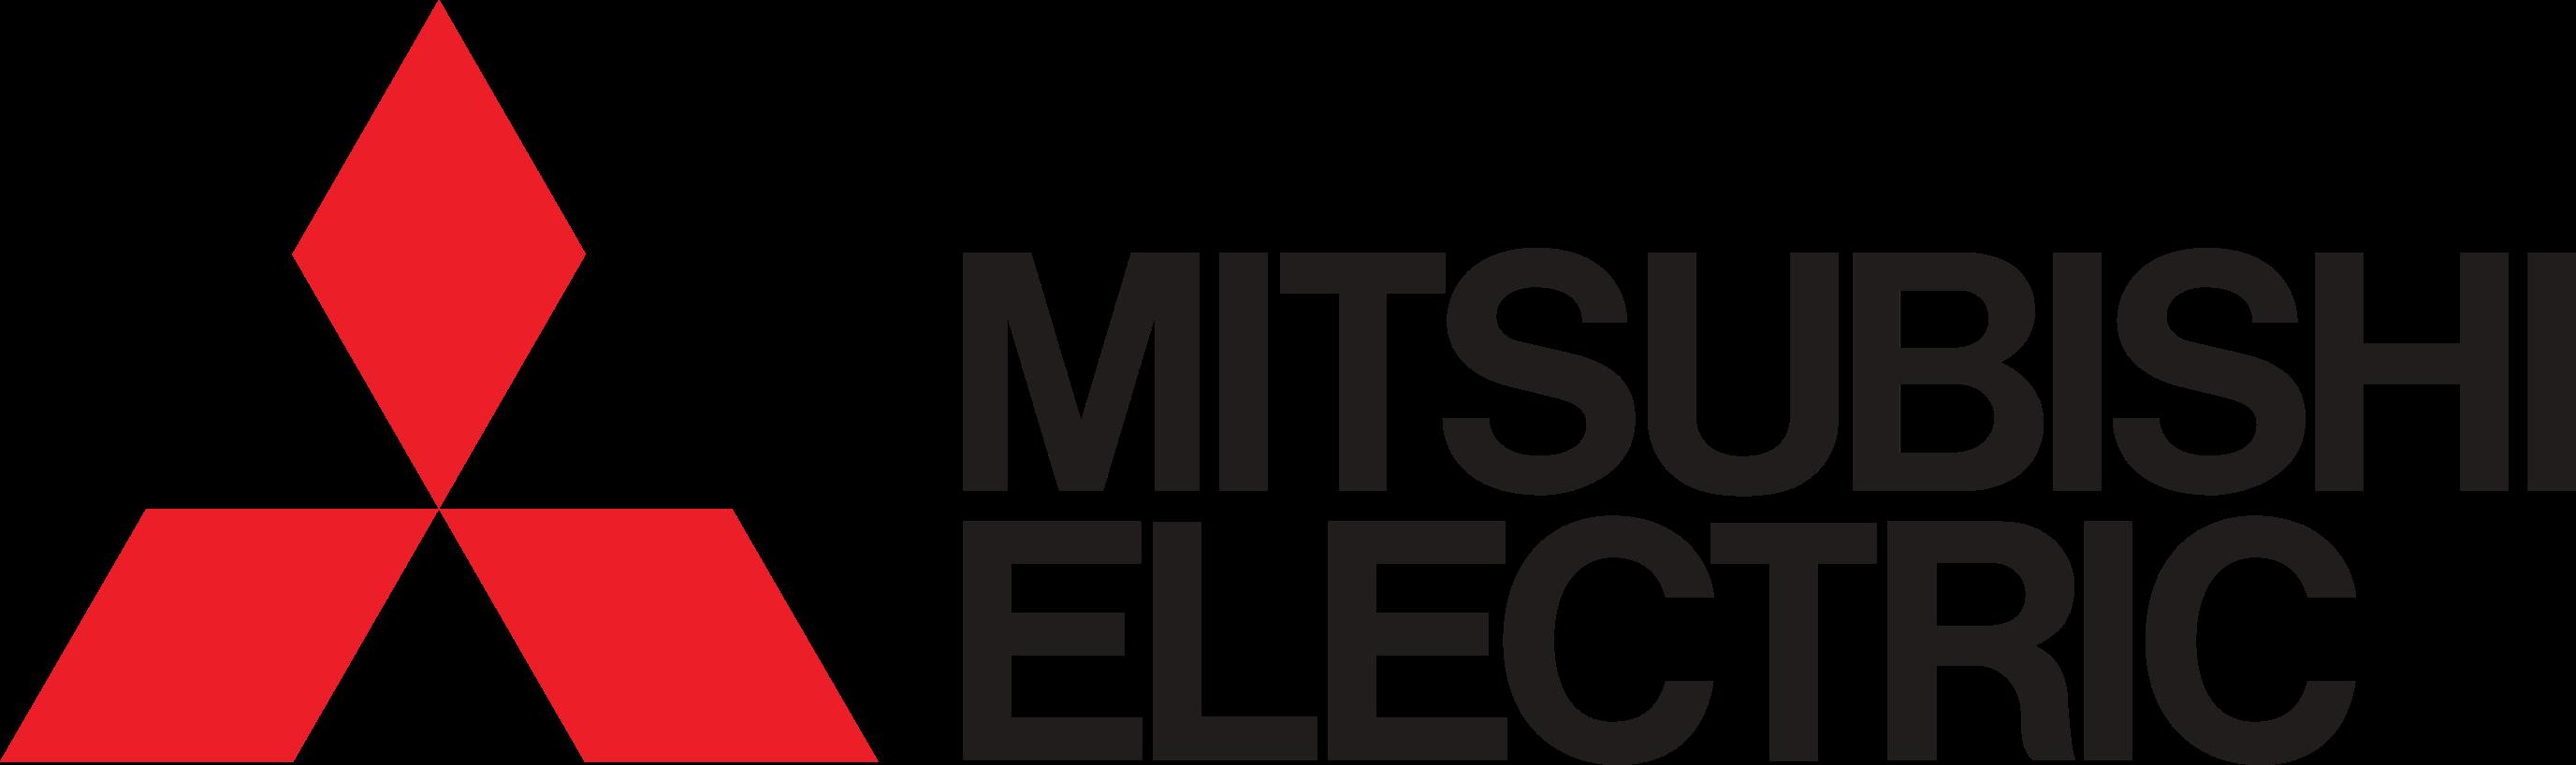 Mitsubishi Electric Research Laboratories